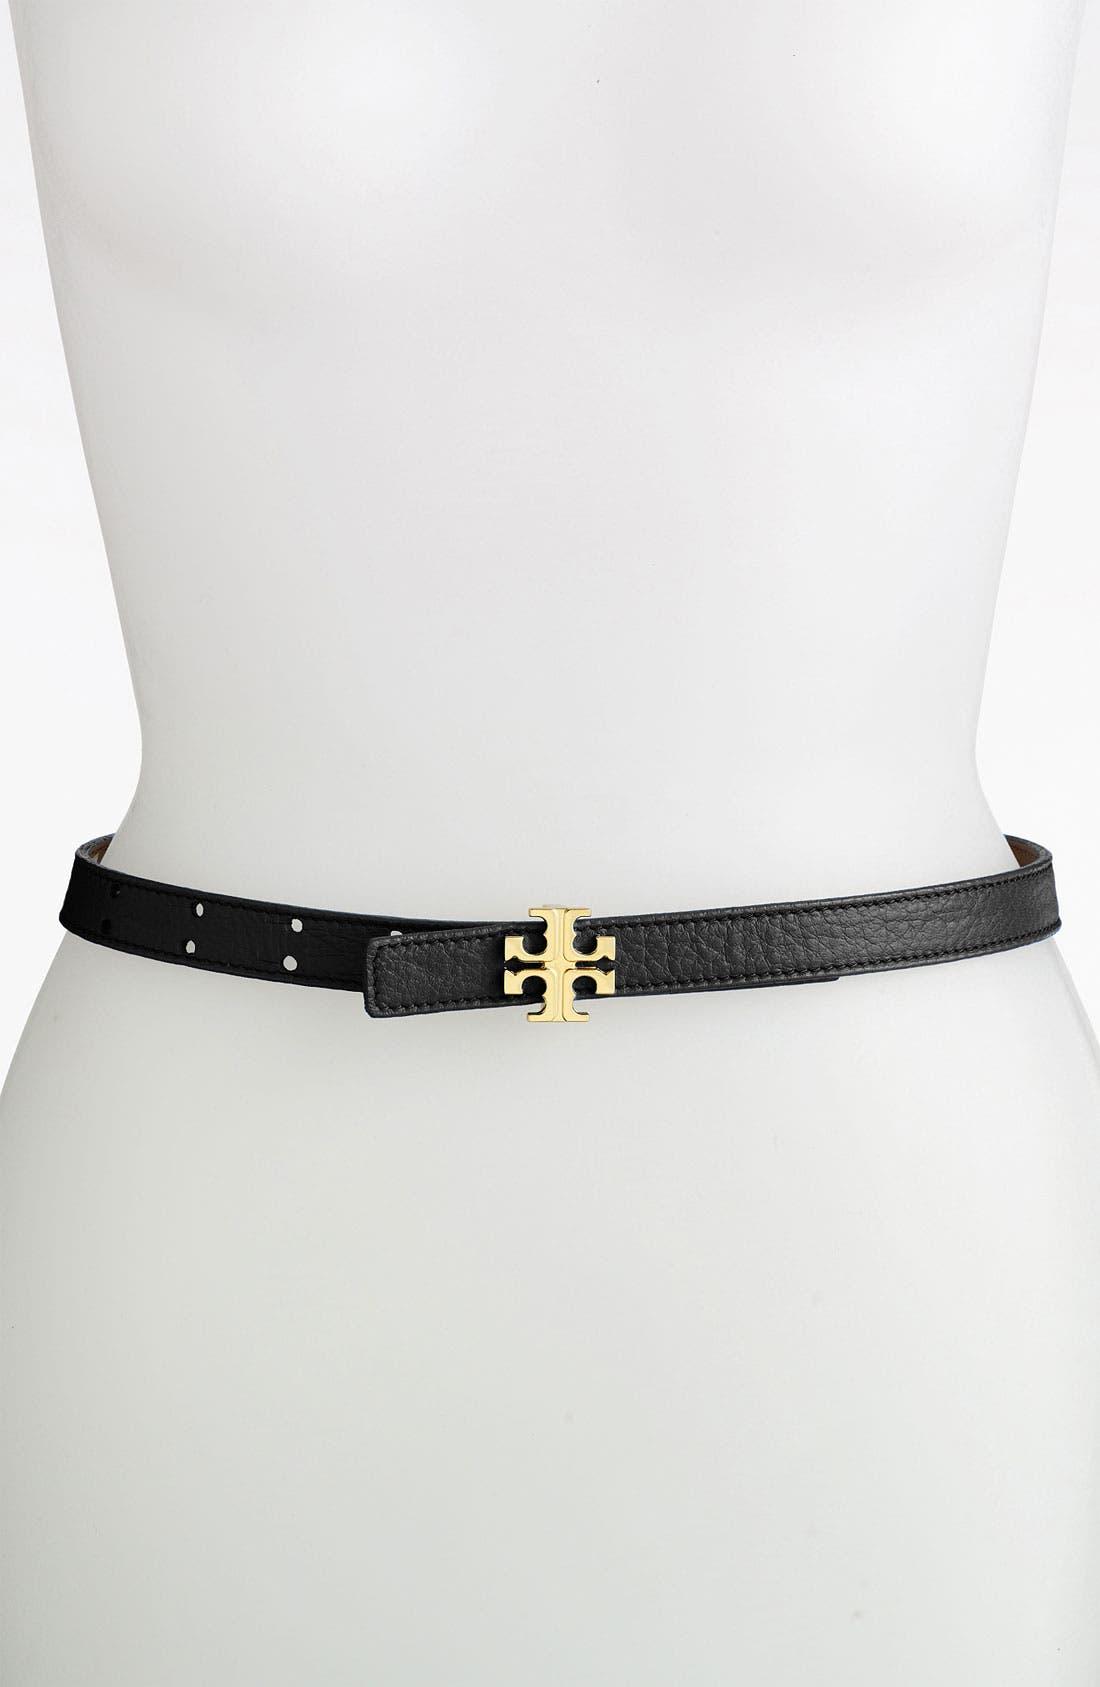 Main Image - Tory Burch Skinny Logo Belt